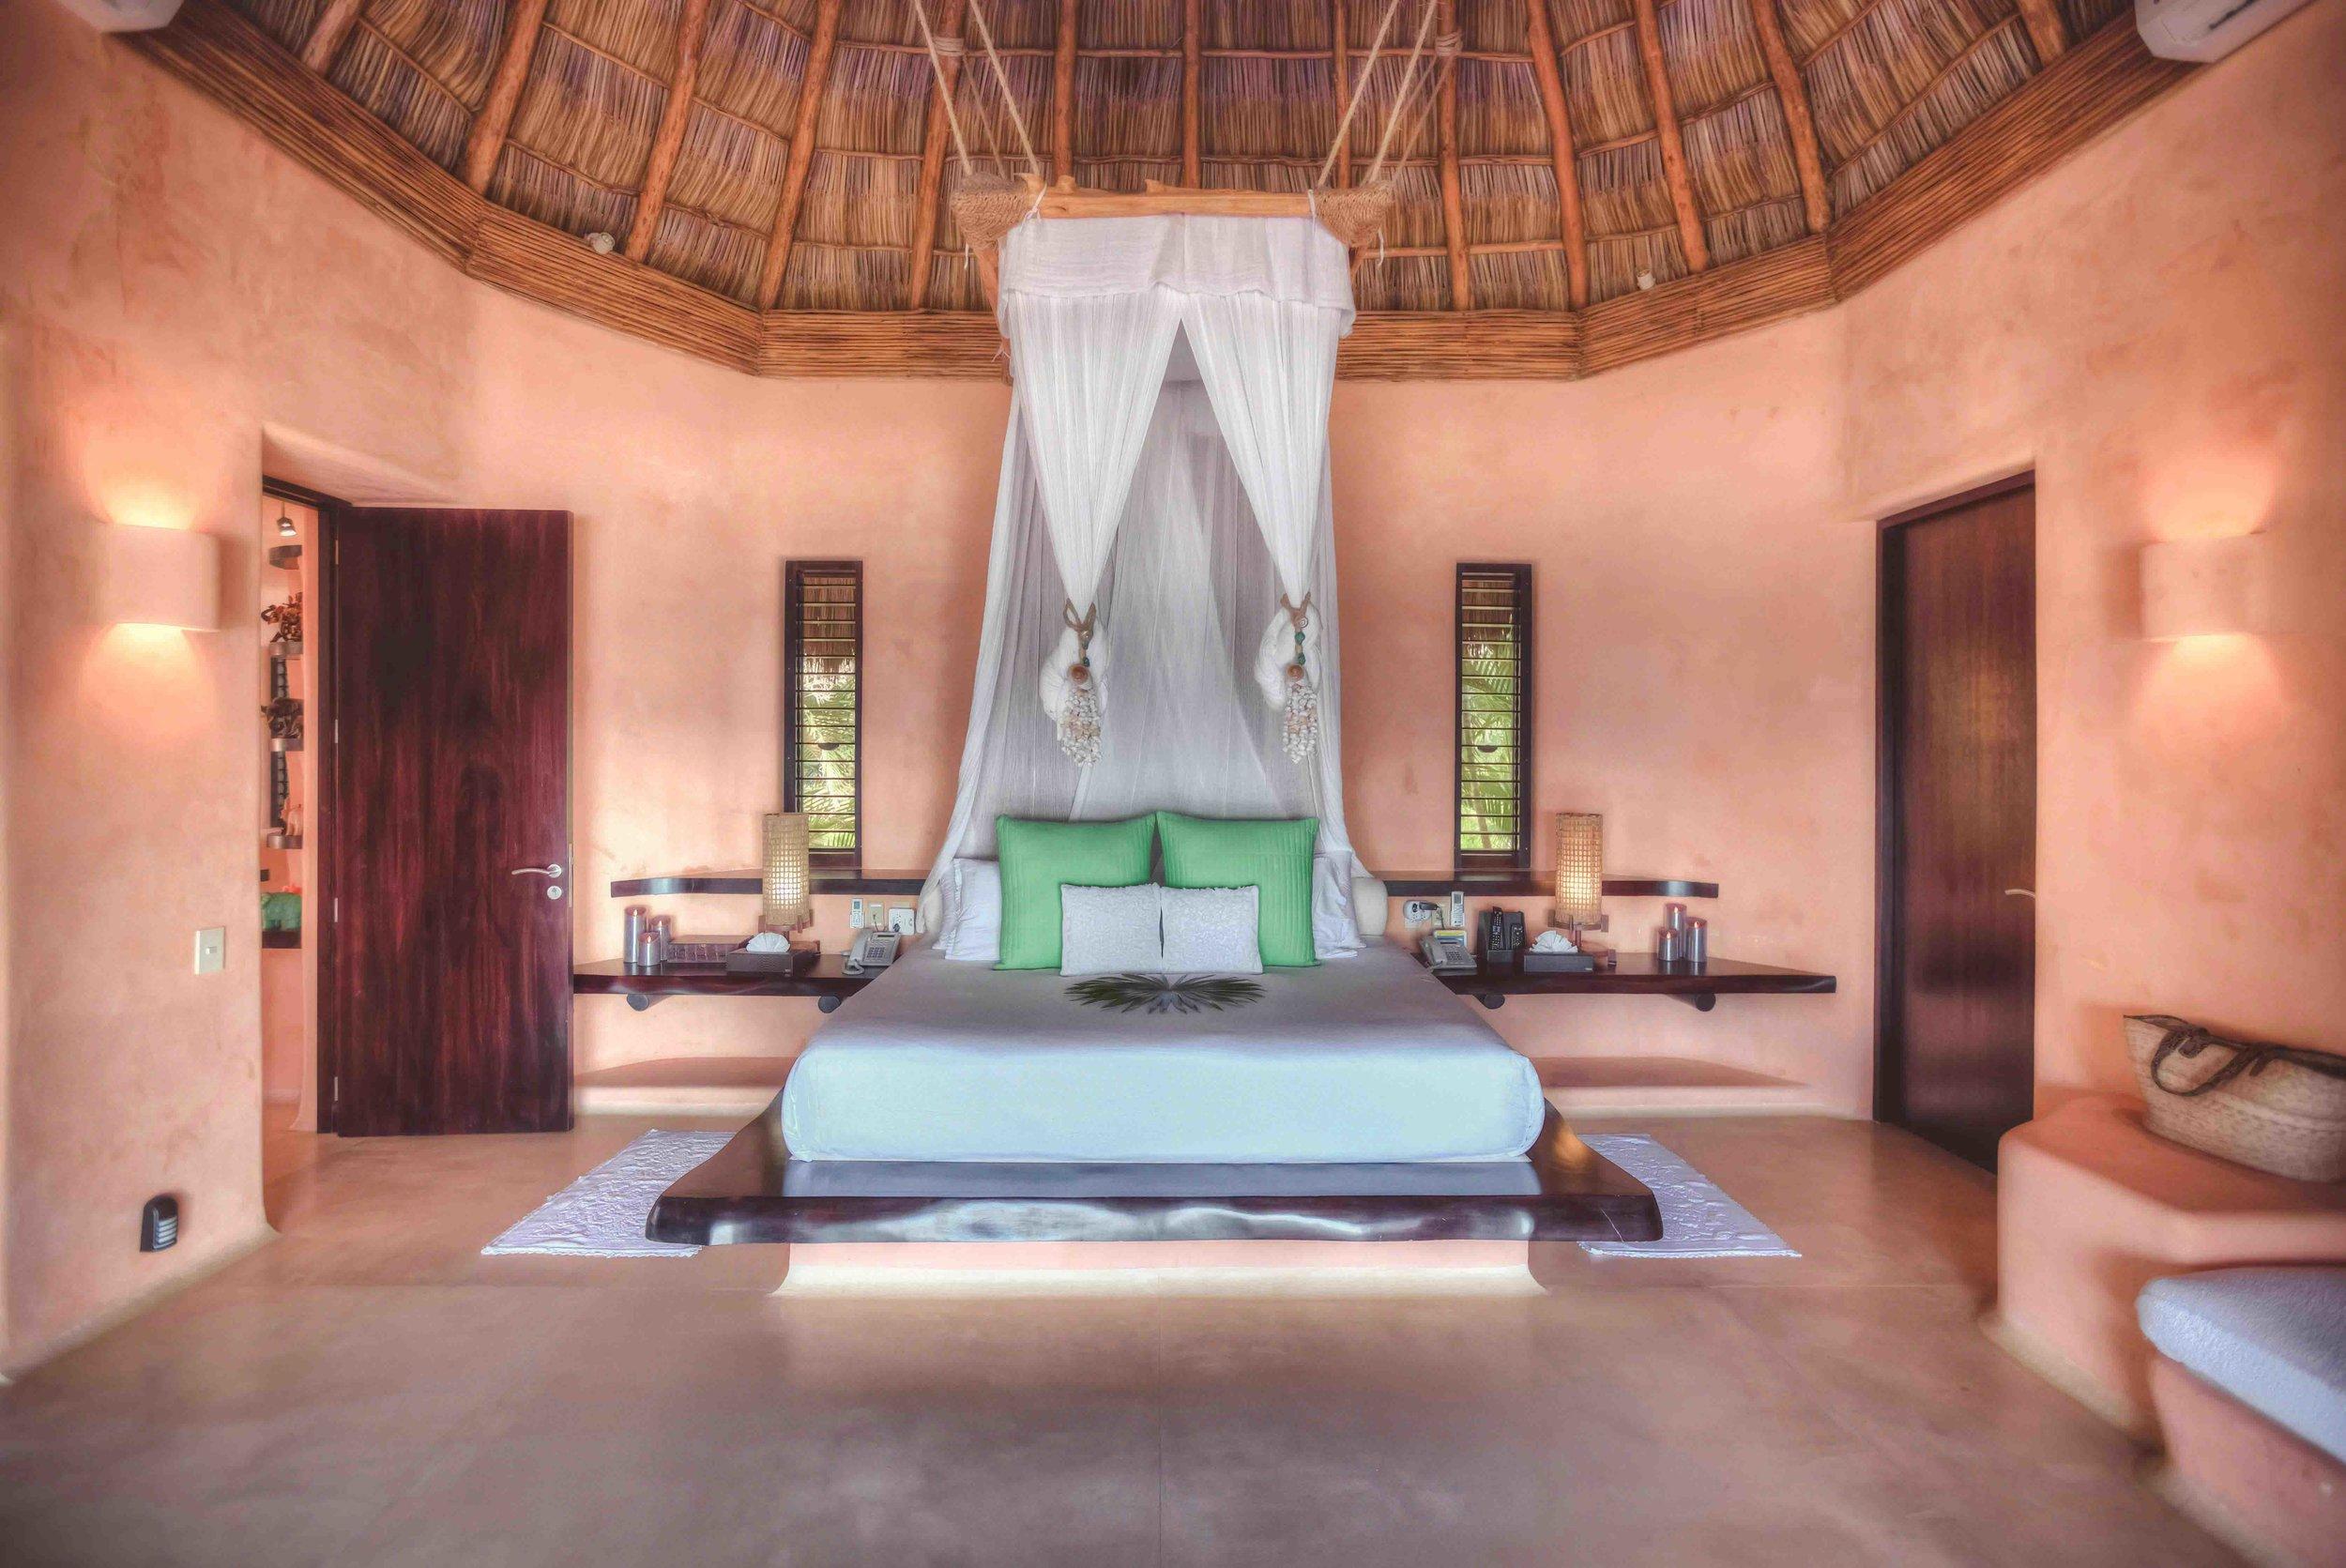 Luxury-Villa-Rental-Mexico-15.jpg